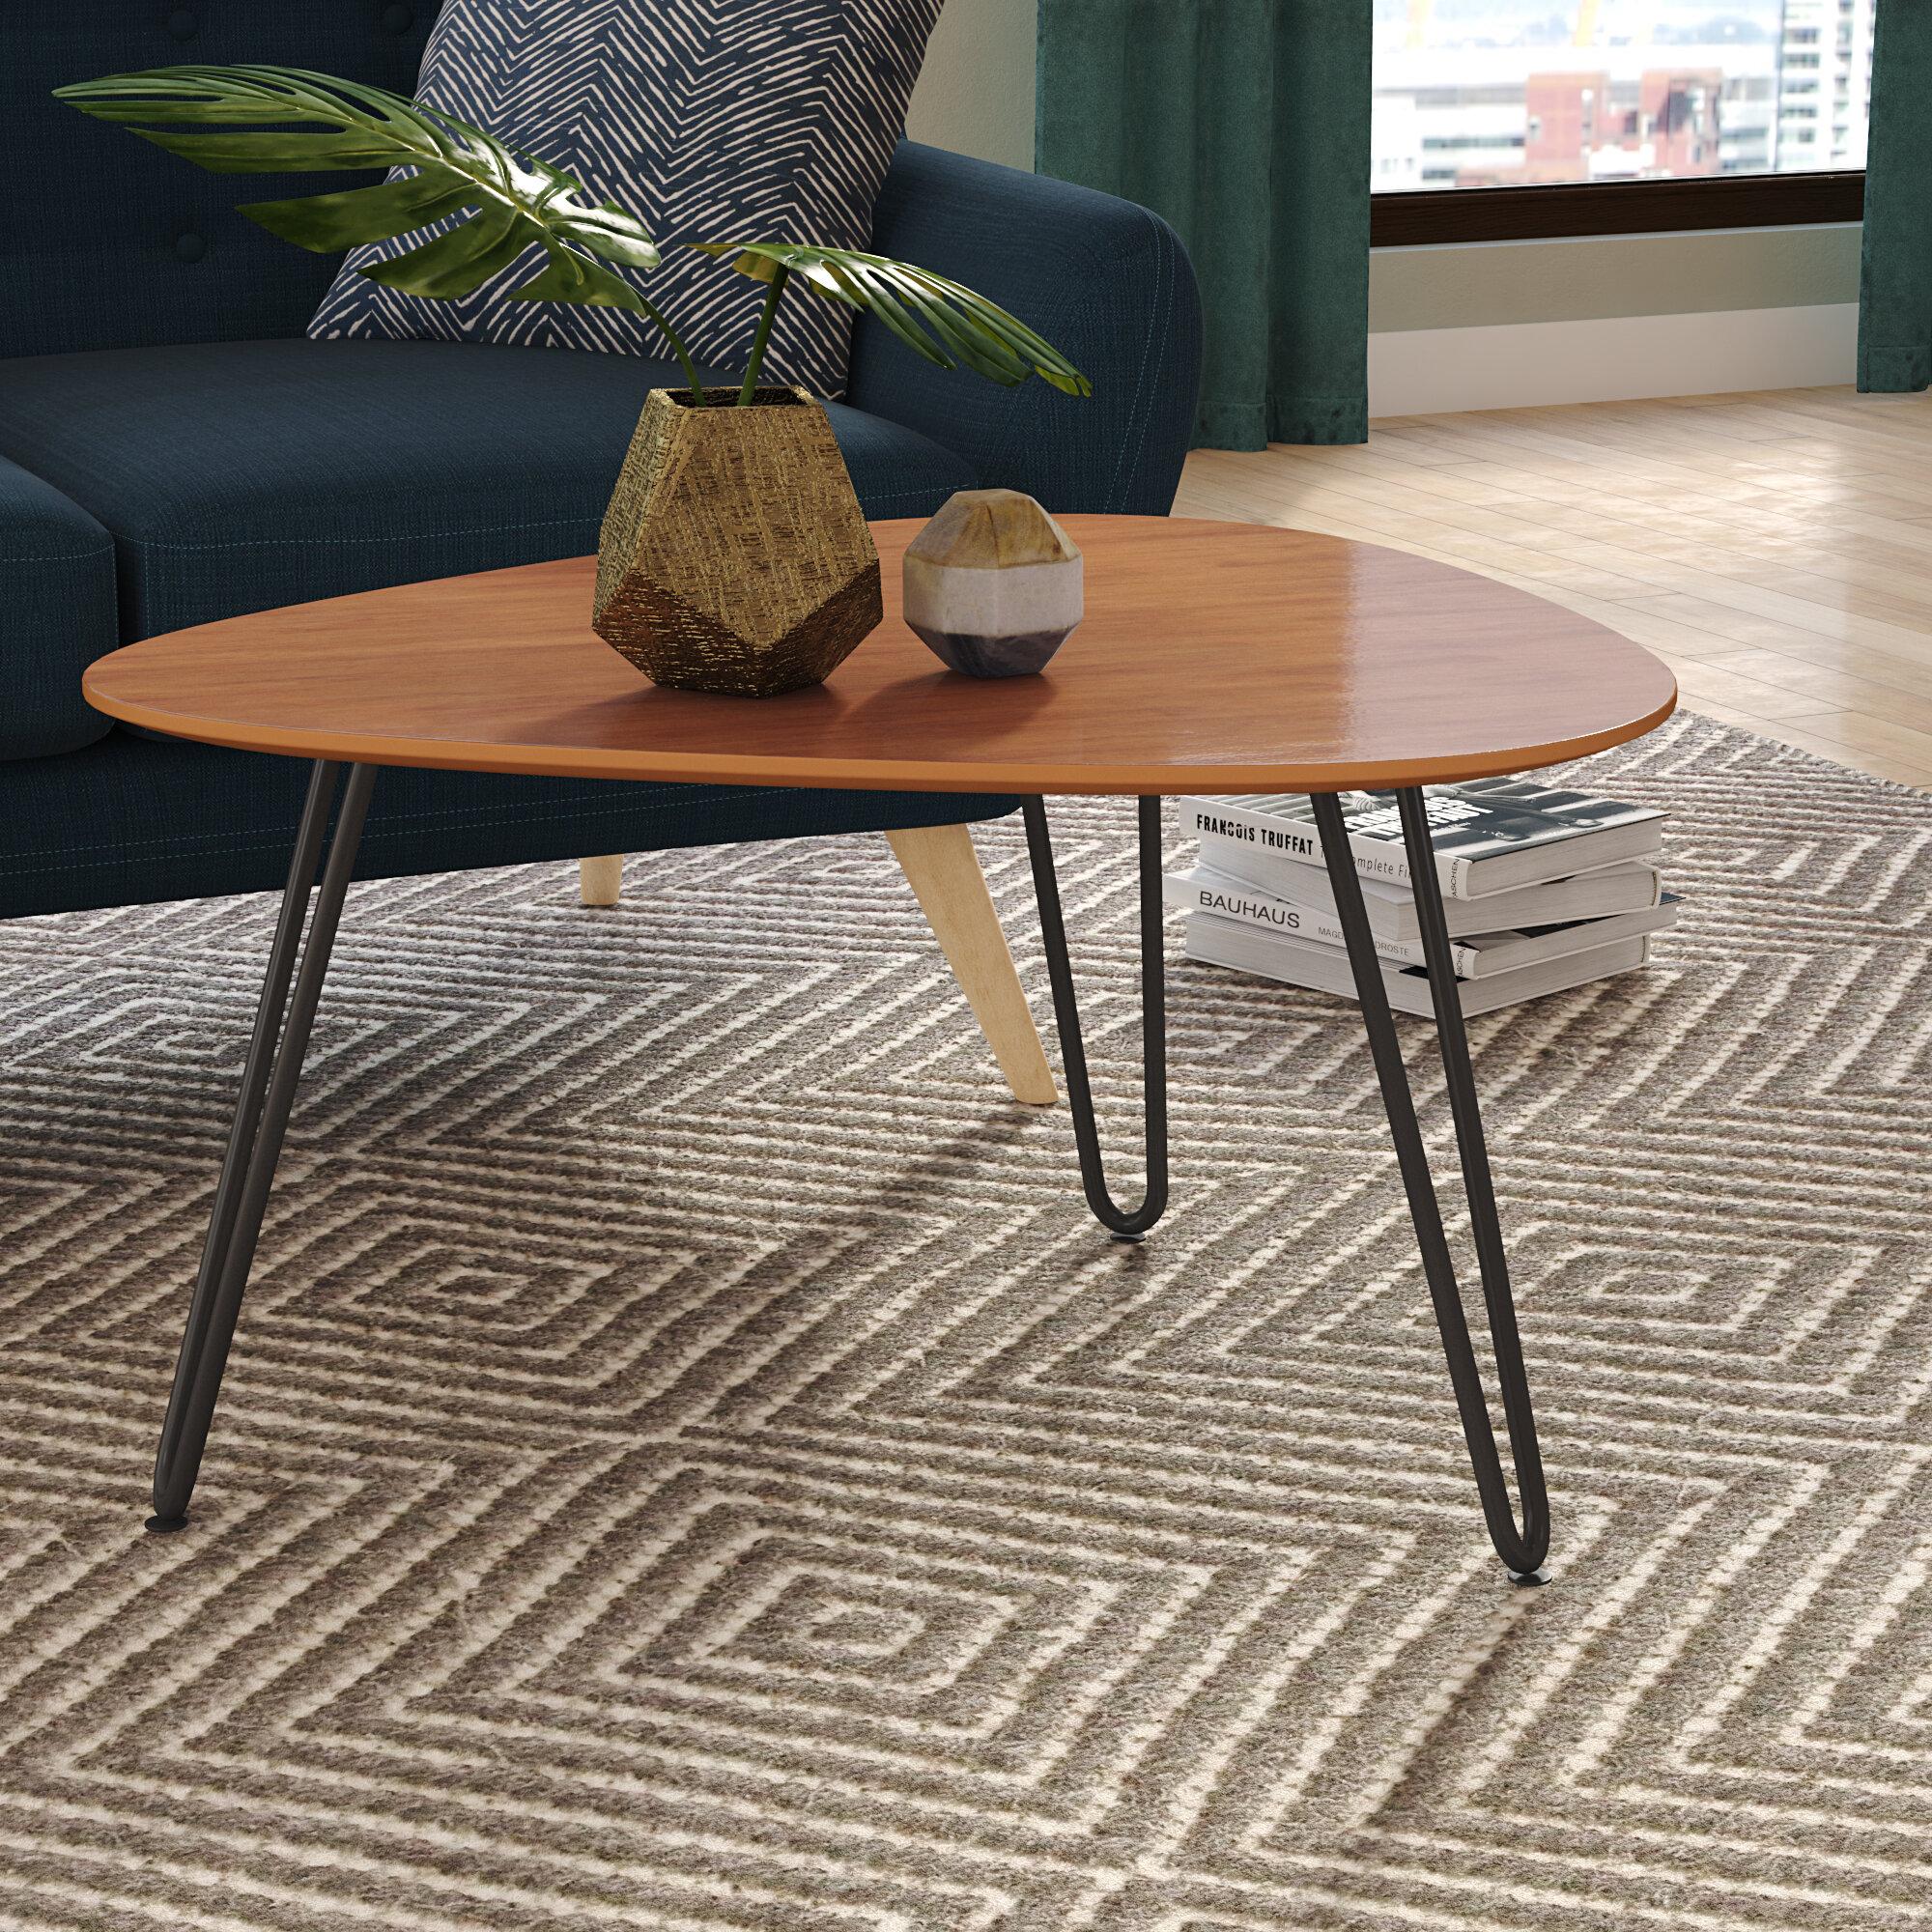 Labarge Hairpin Leg Wood Coffee Table